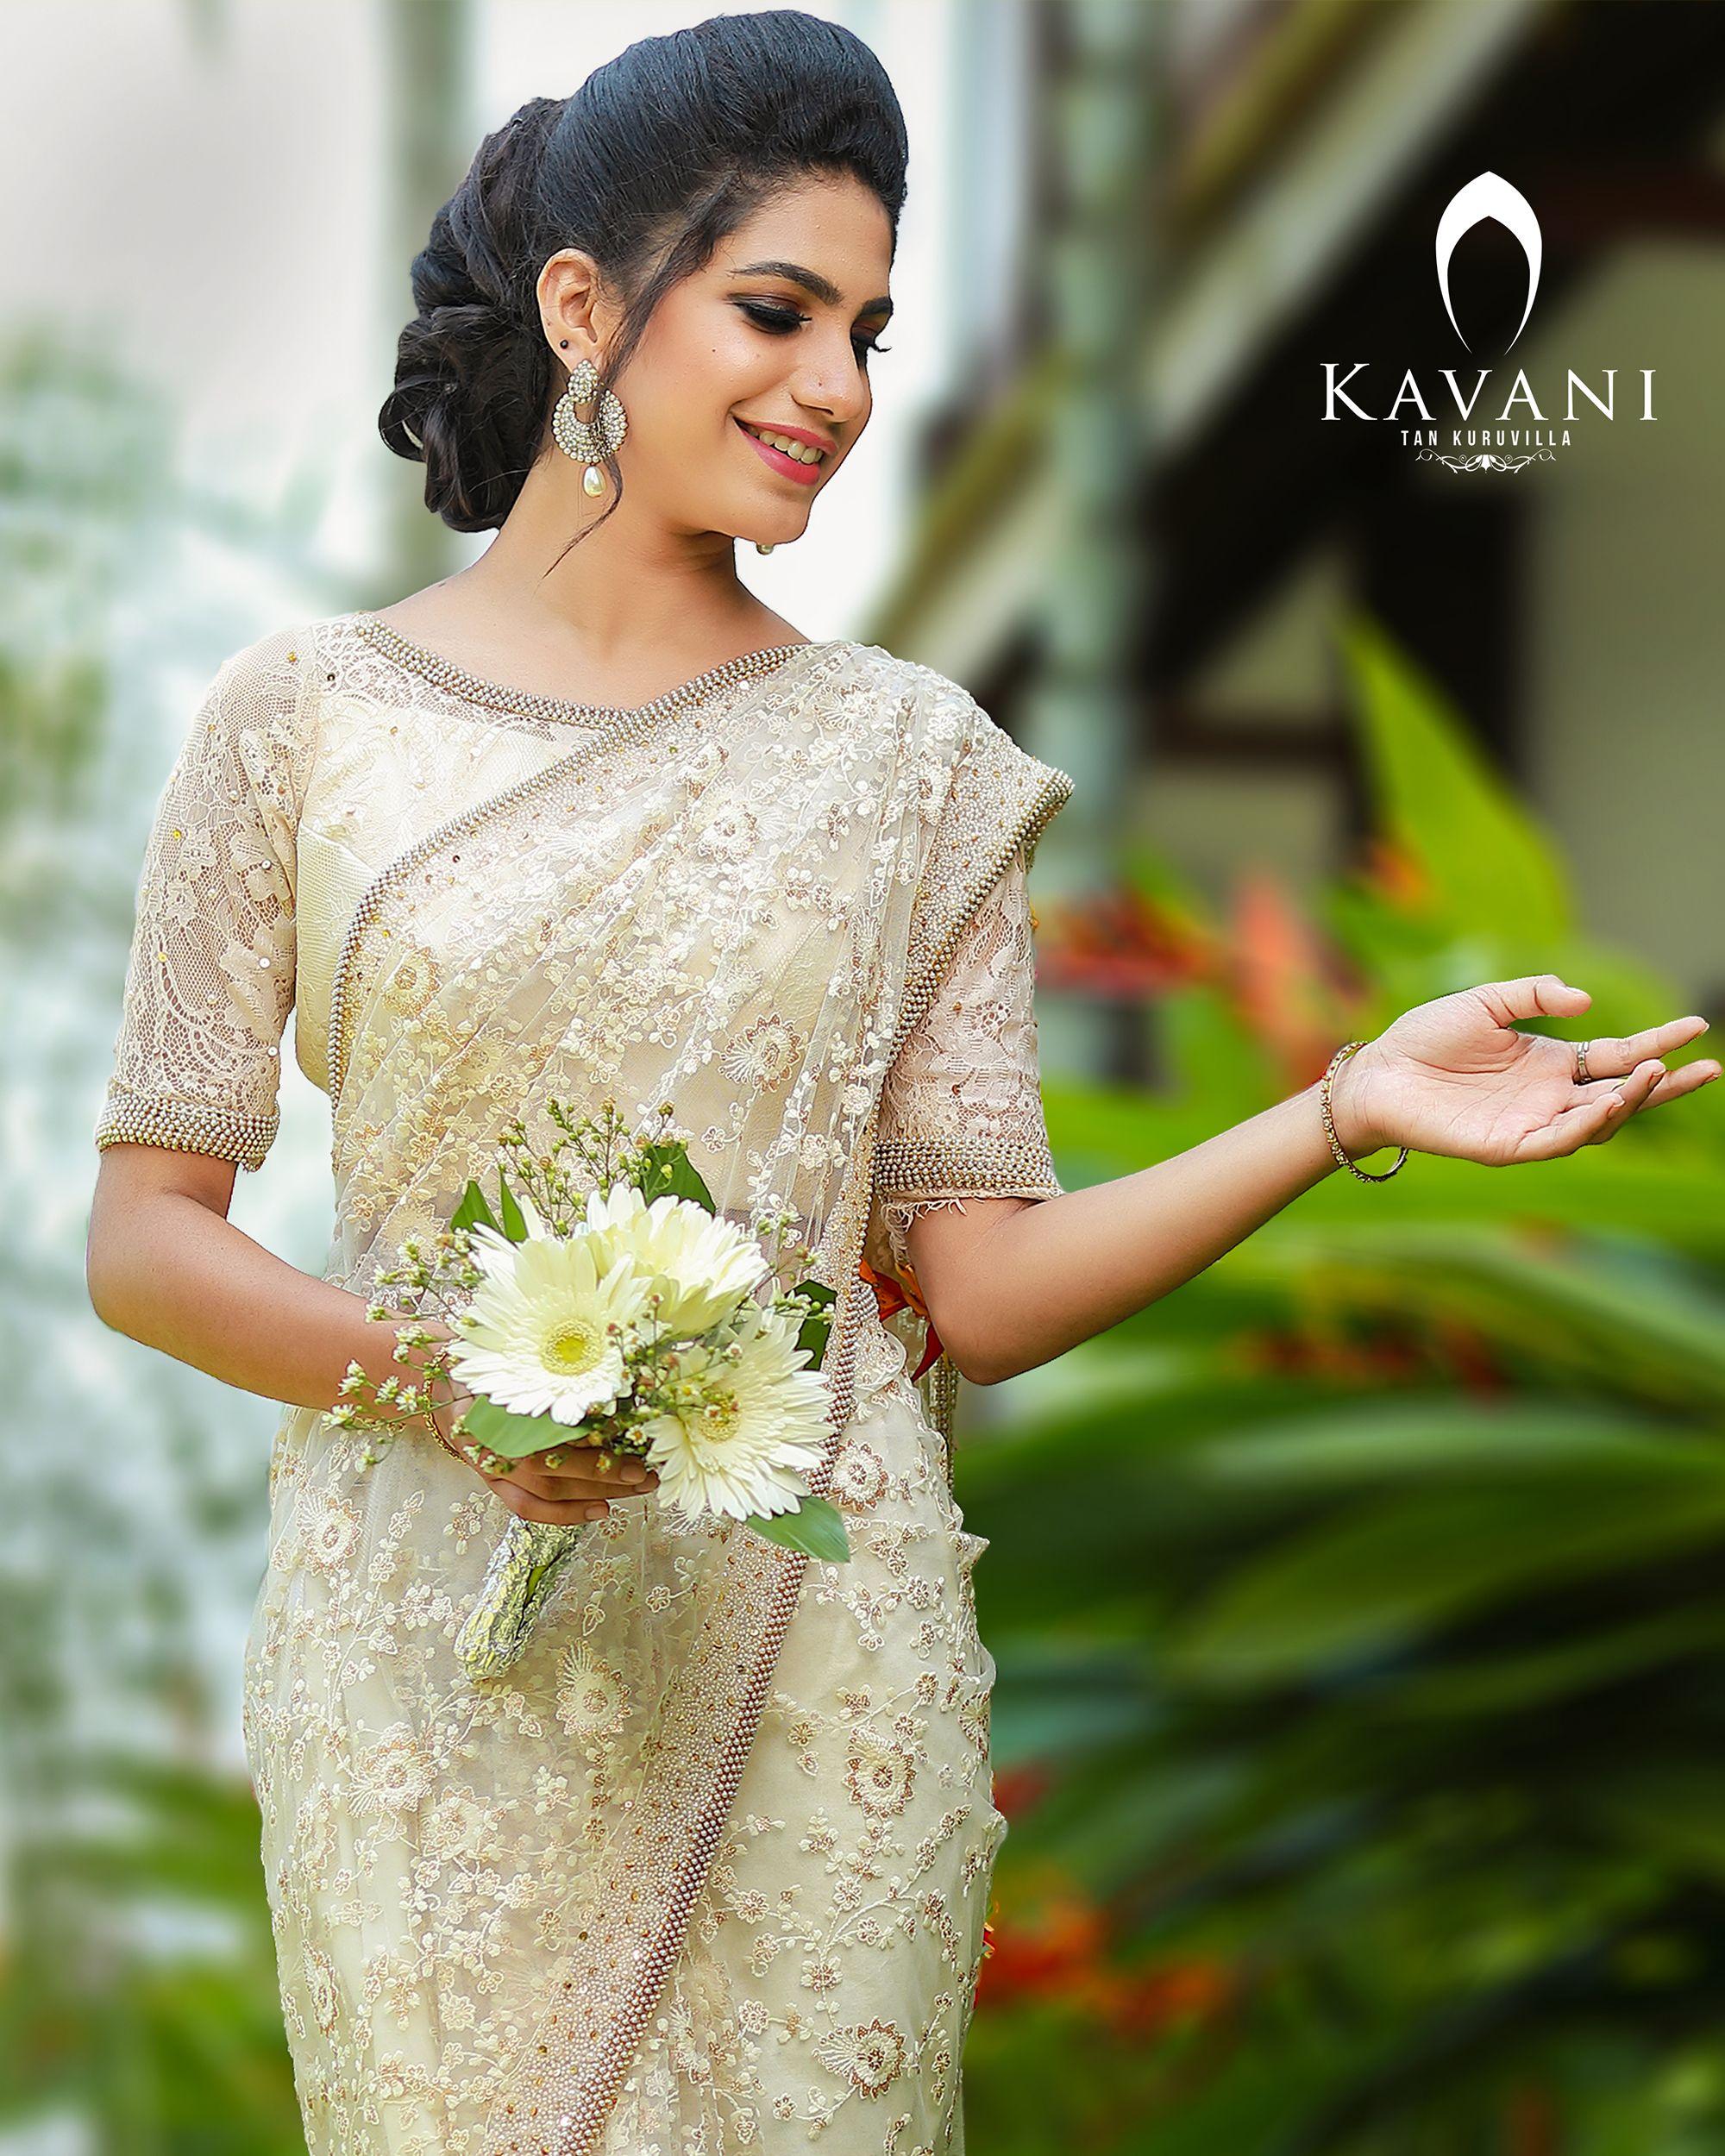 Kerala Wedding Bridal Images: Pin By Kavani On Christian Wedding Saree In 2019